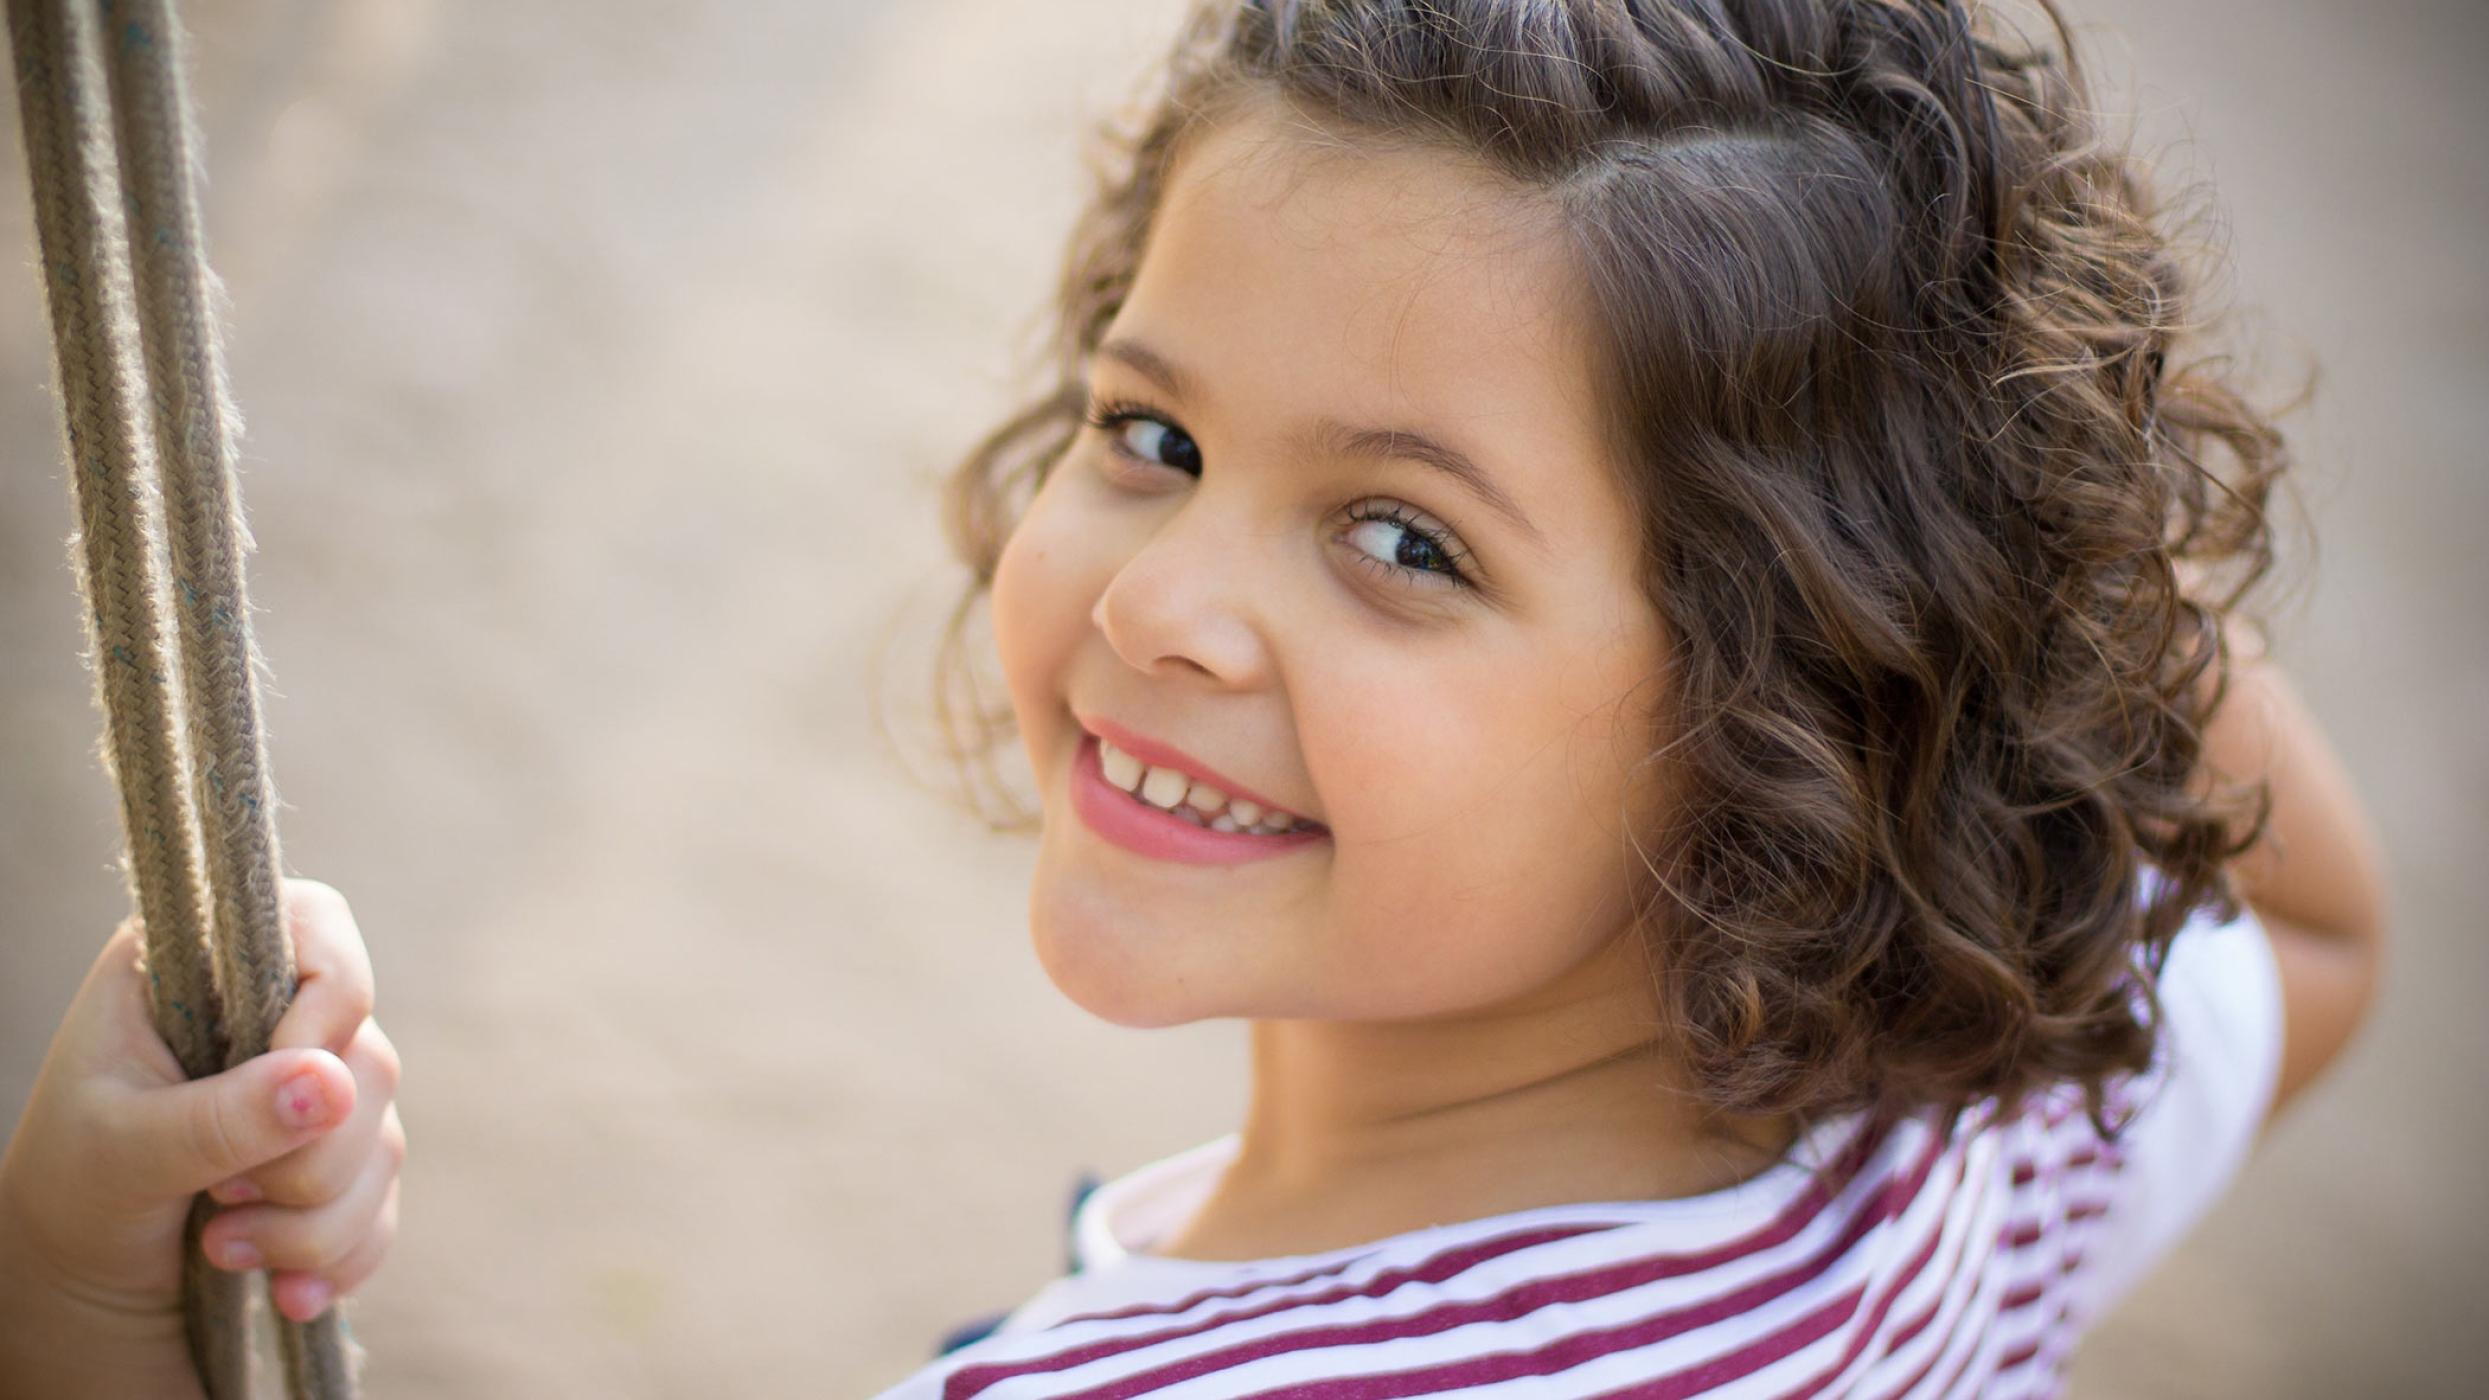 Playground Safety First - Kid on Swing Set